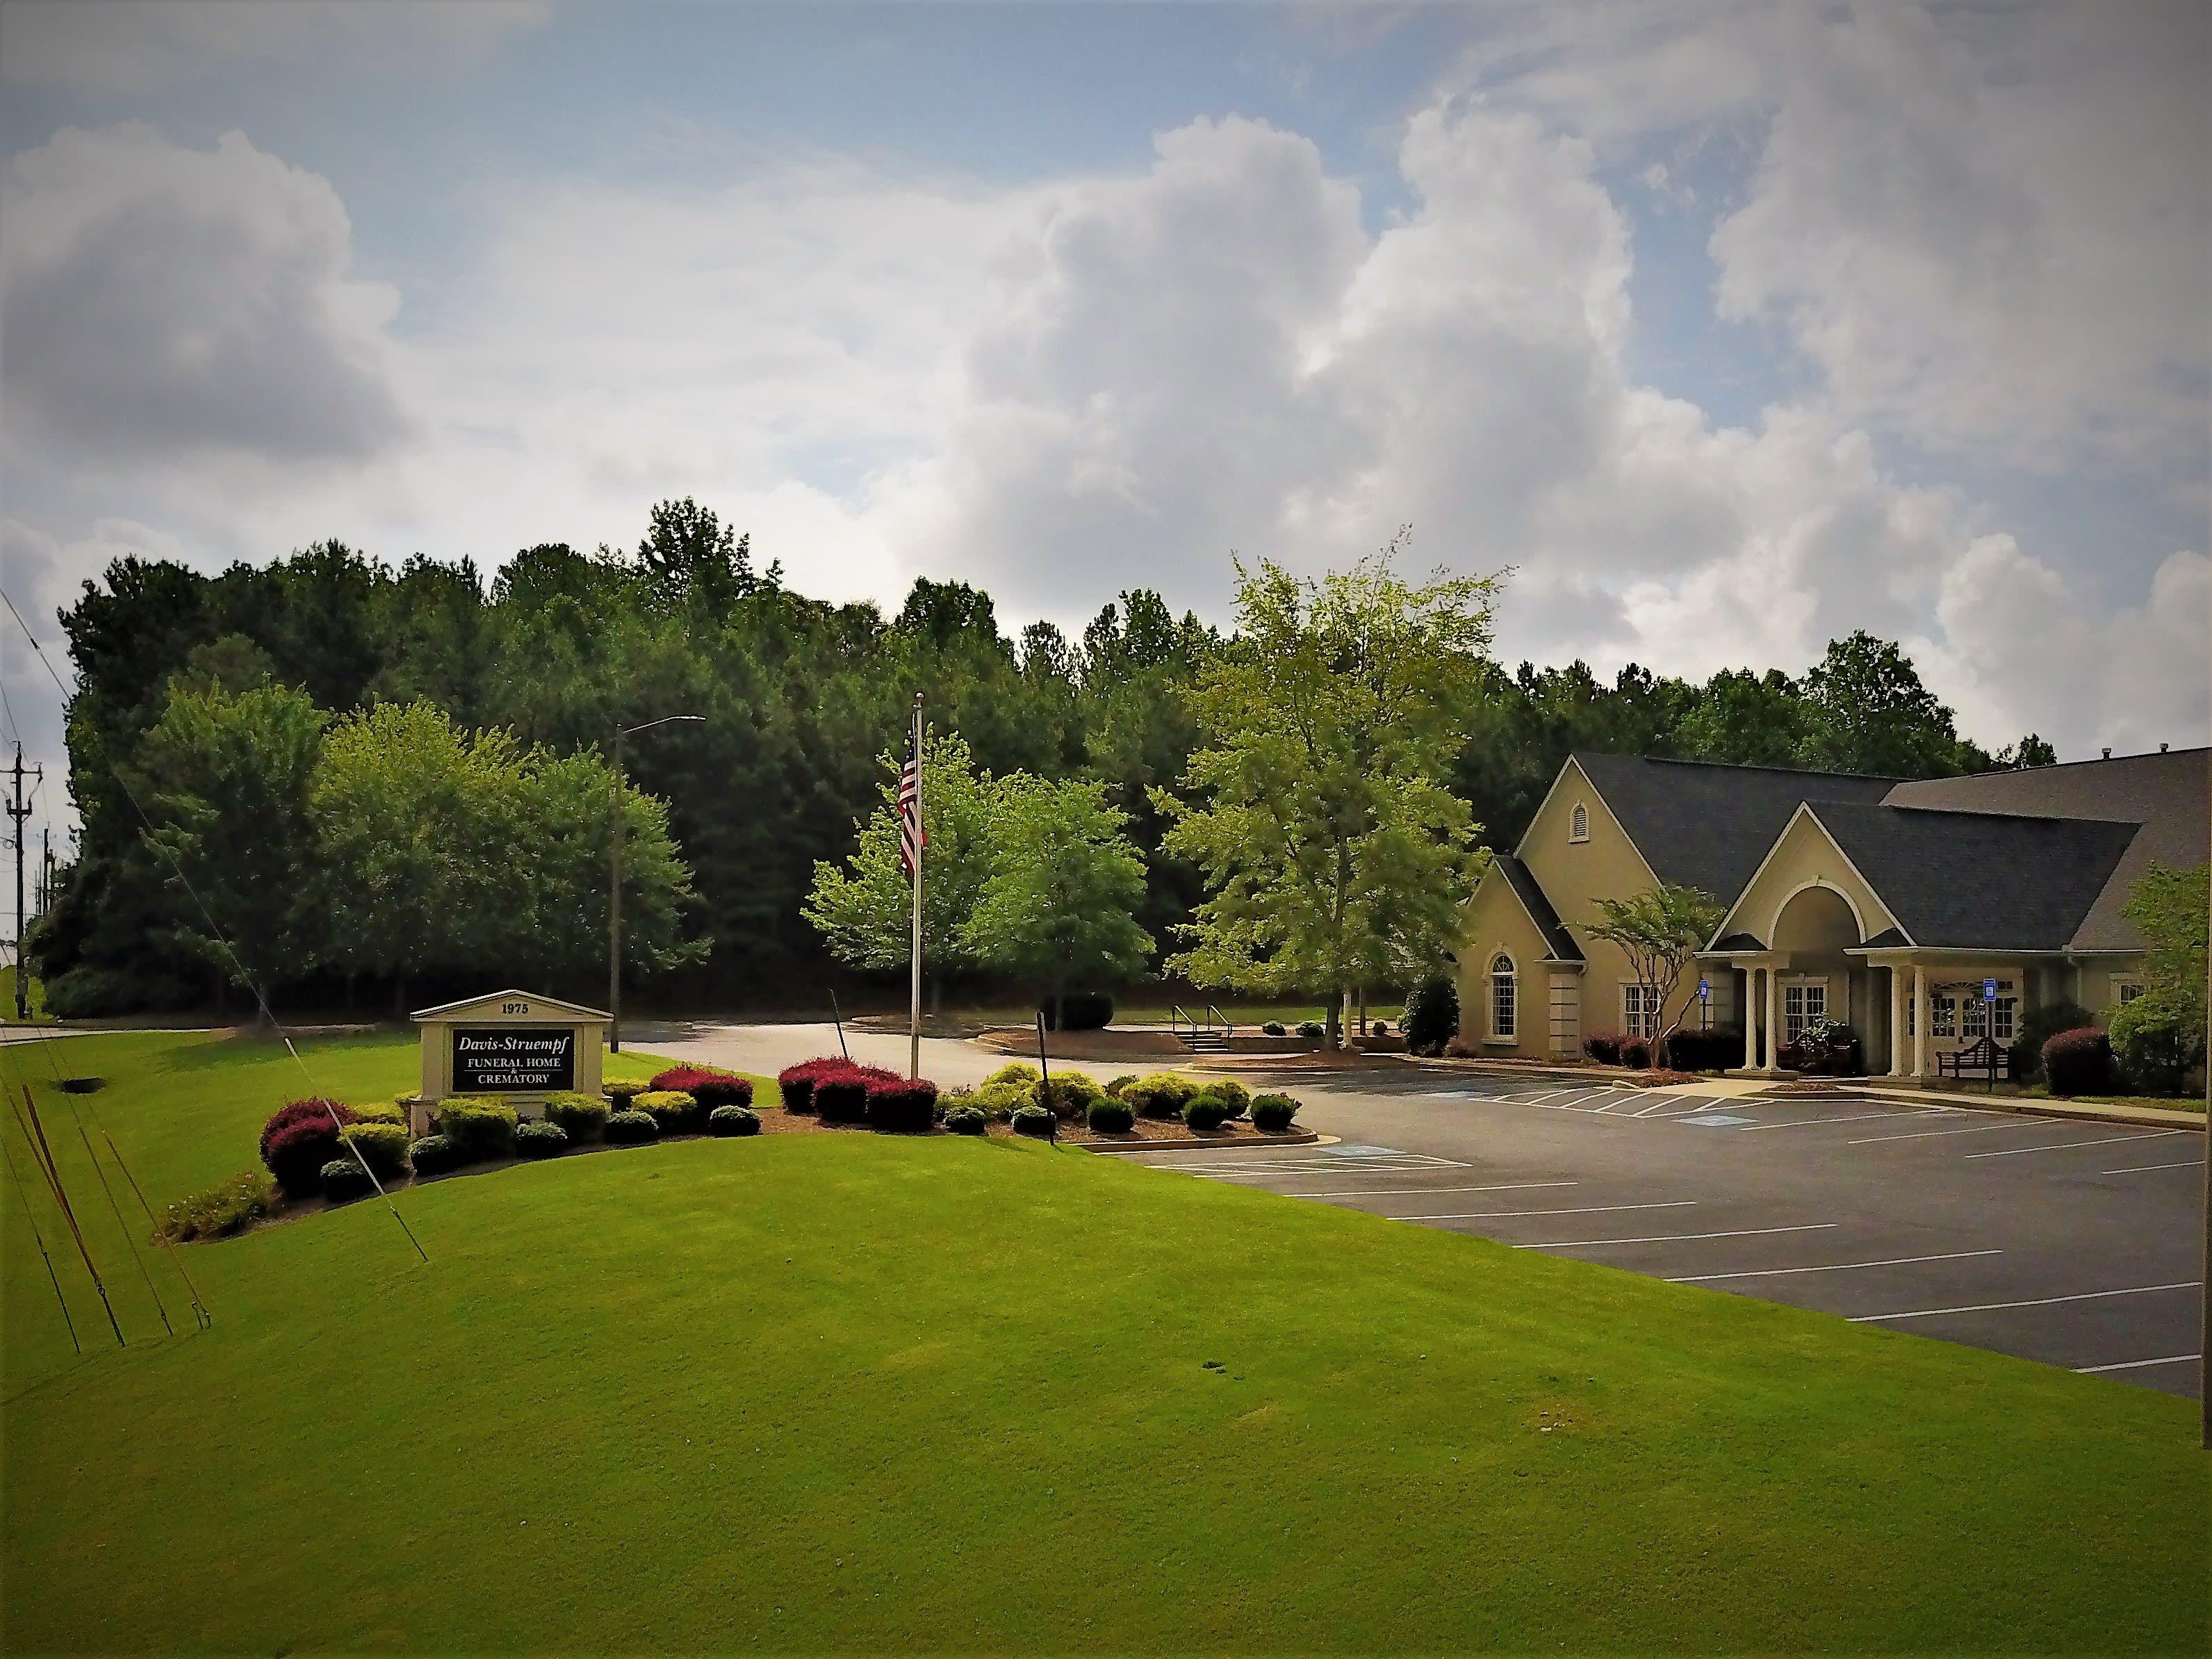 Funeral Home & Cremations Hiram, GA | Davis-Struempf Funeral